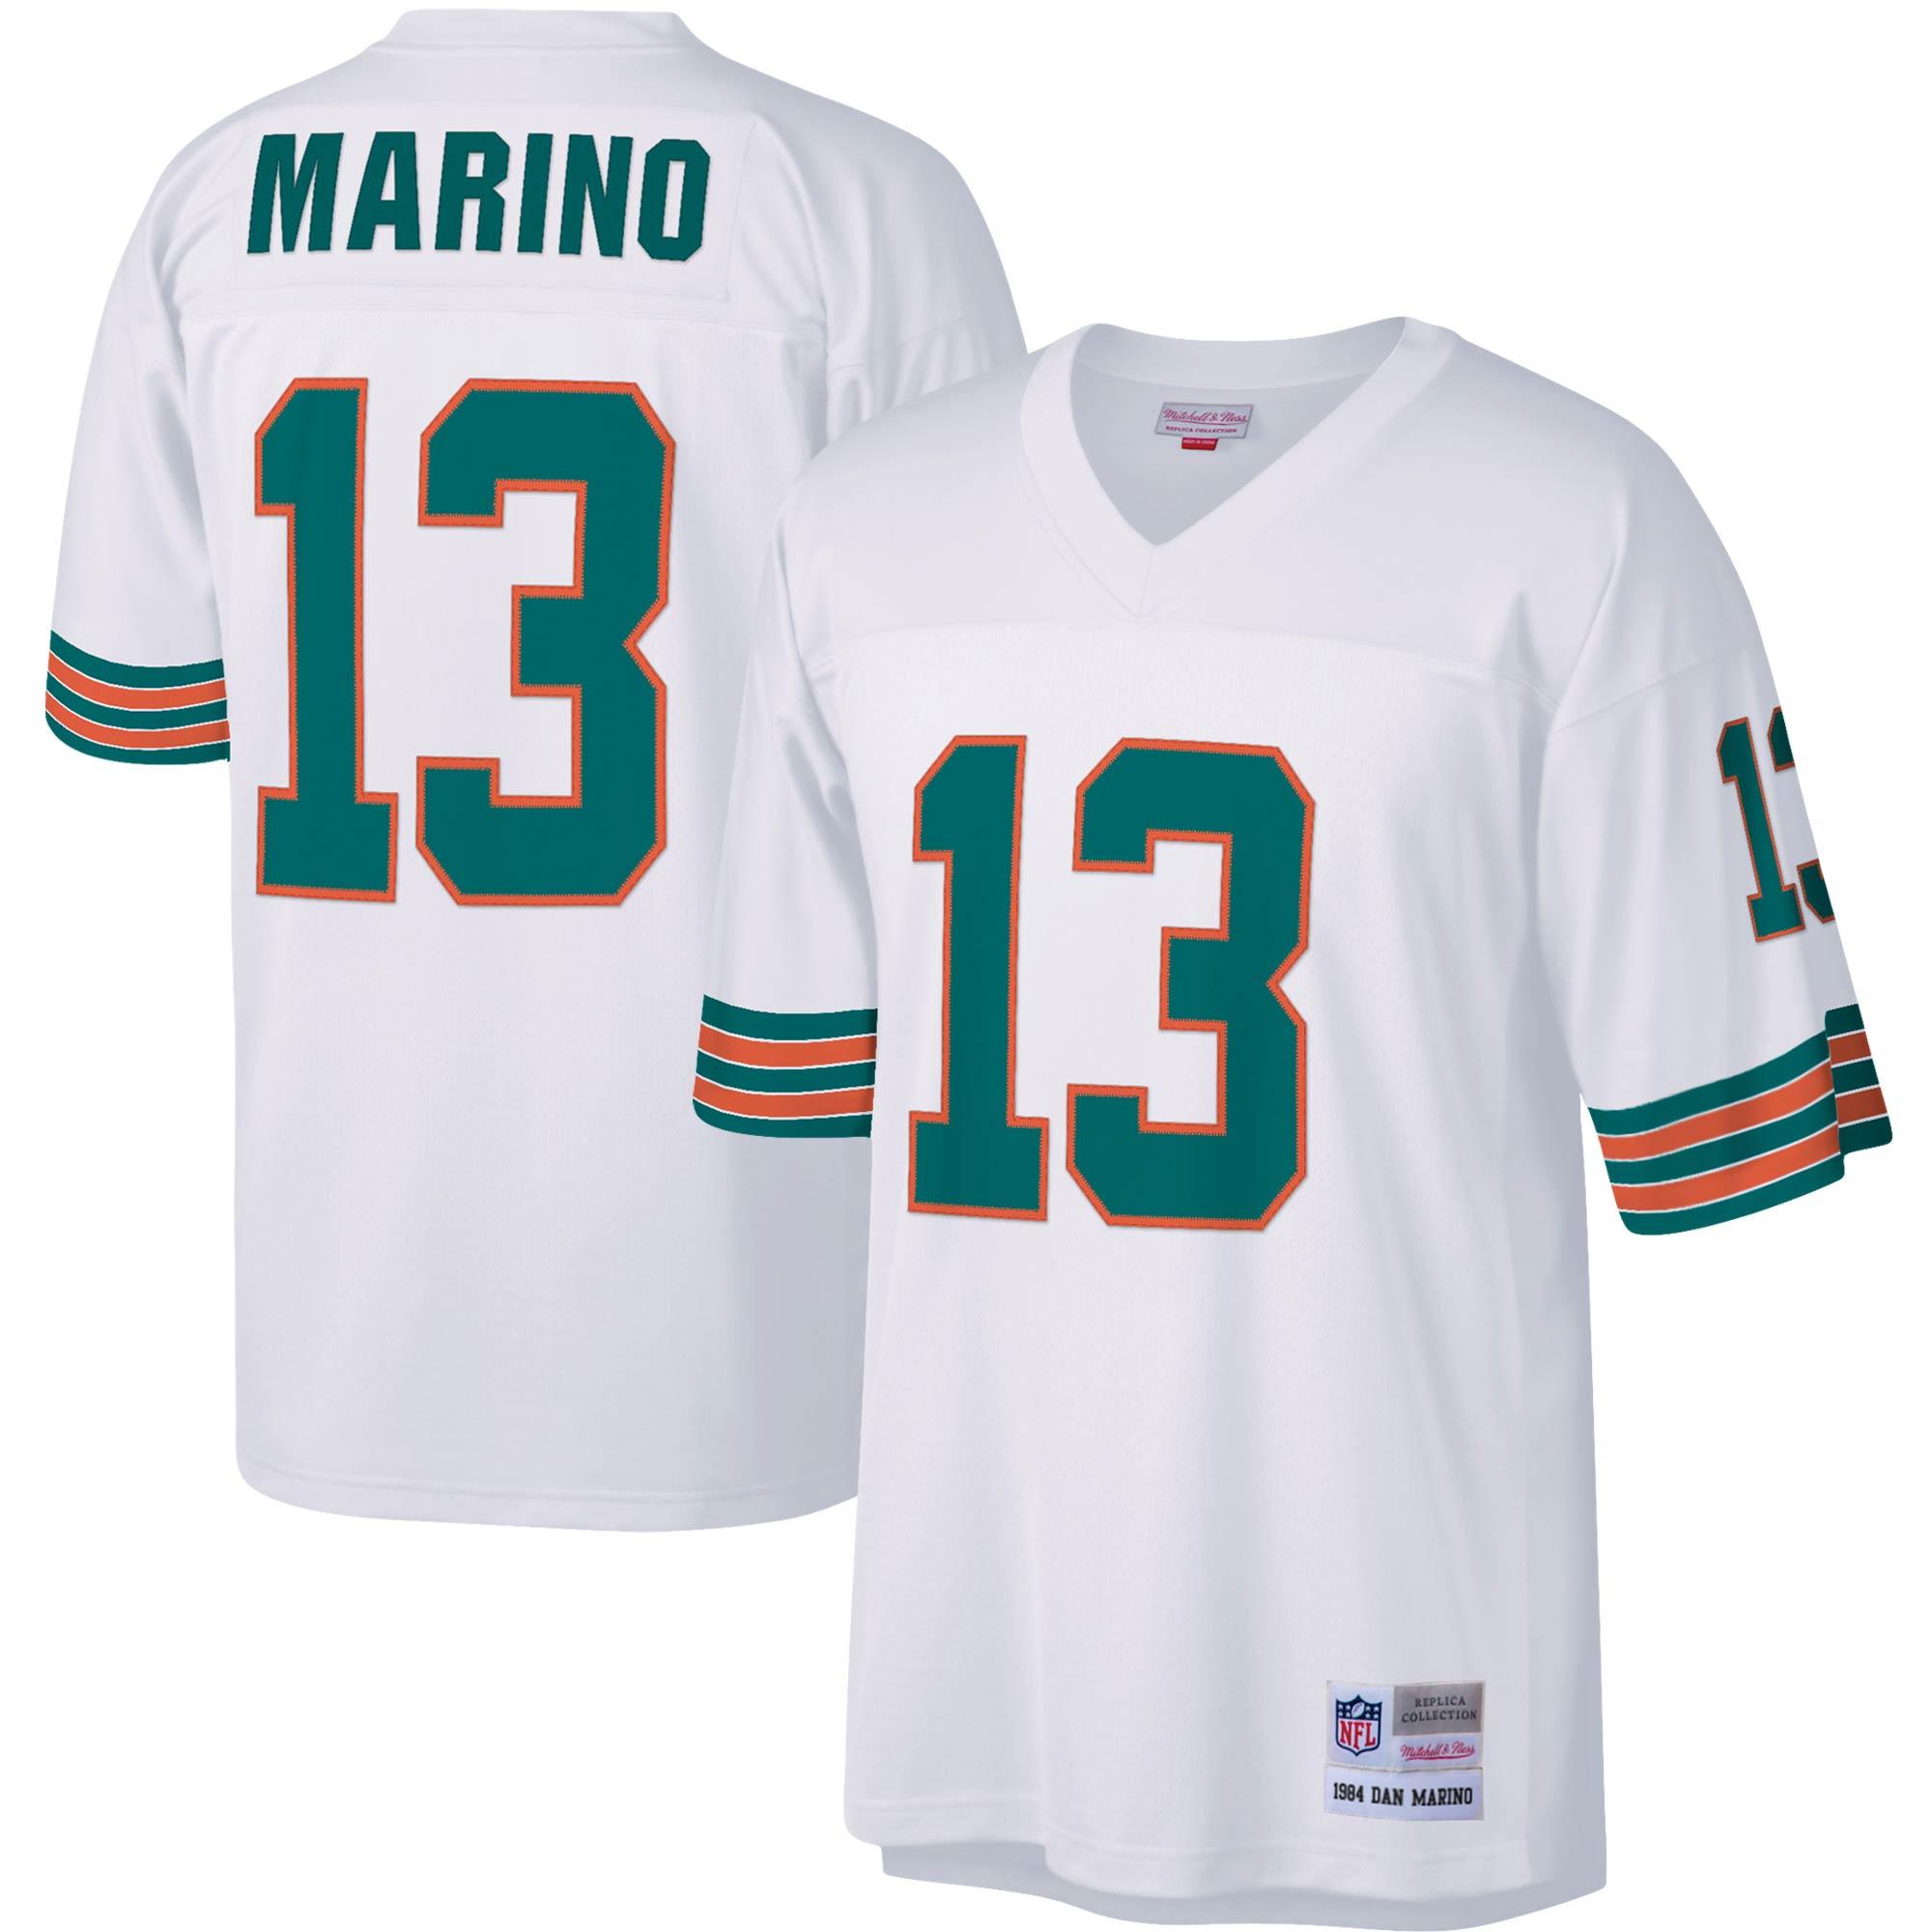 Dan Marino Miami Dolphins Mitchell & Ness Legacy Replica Jersey - White